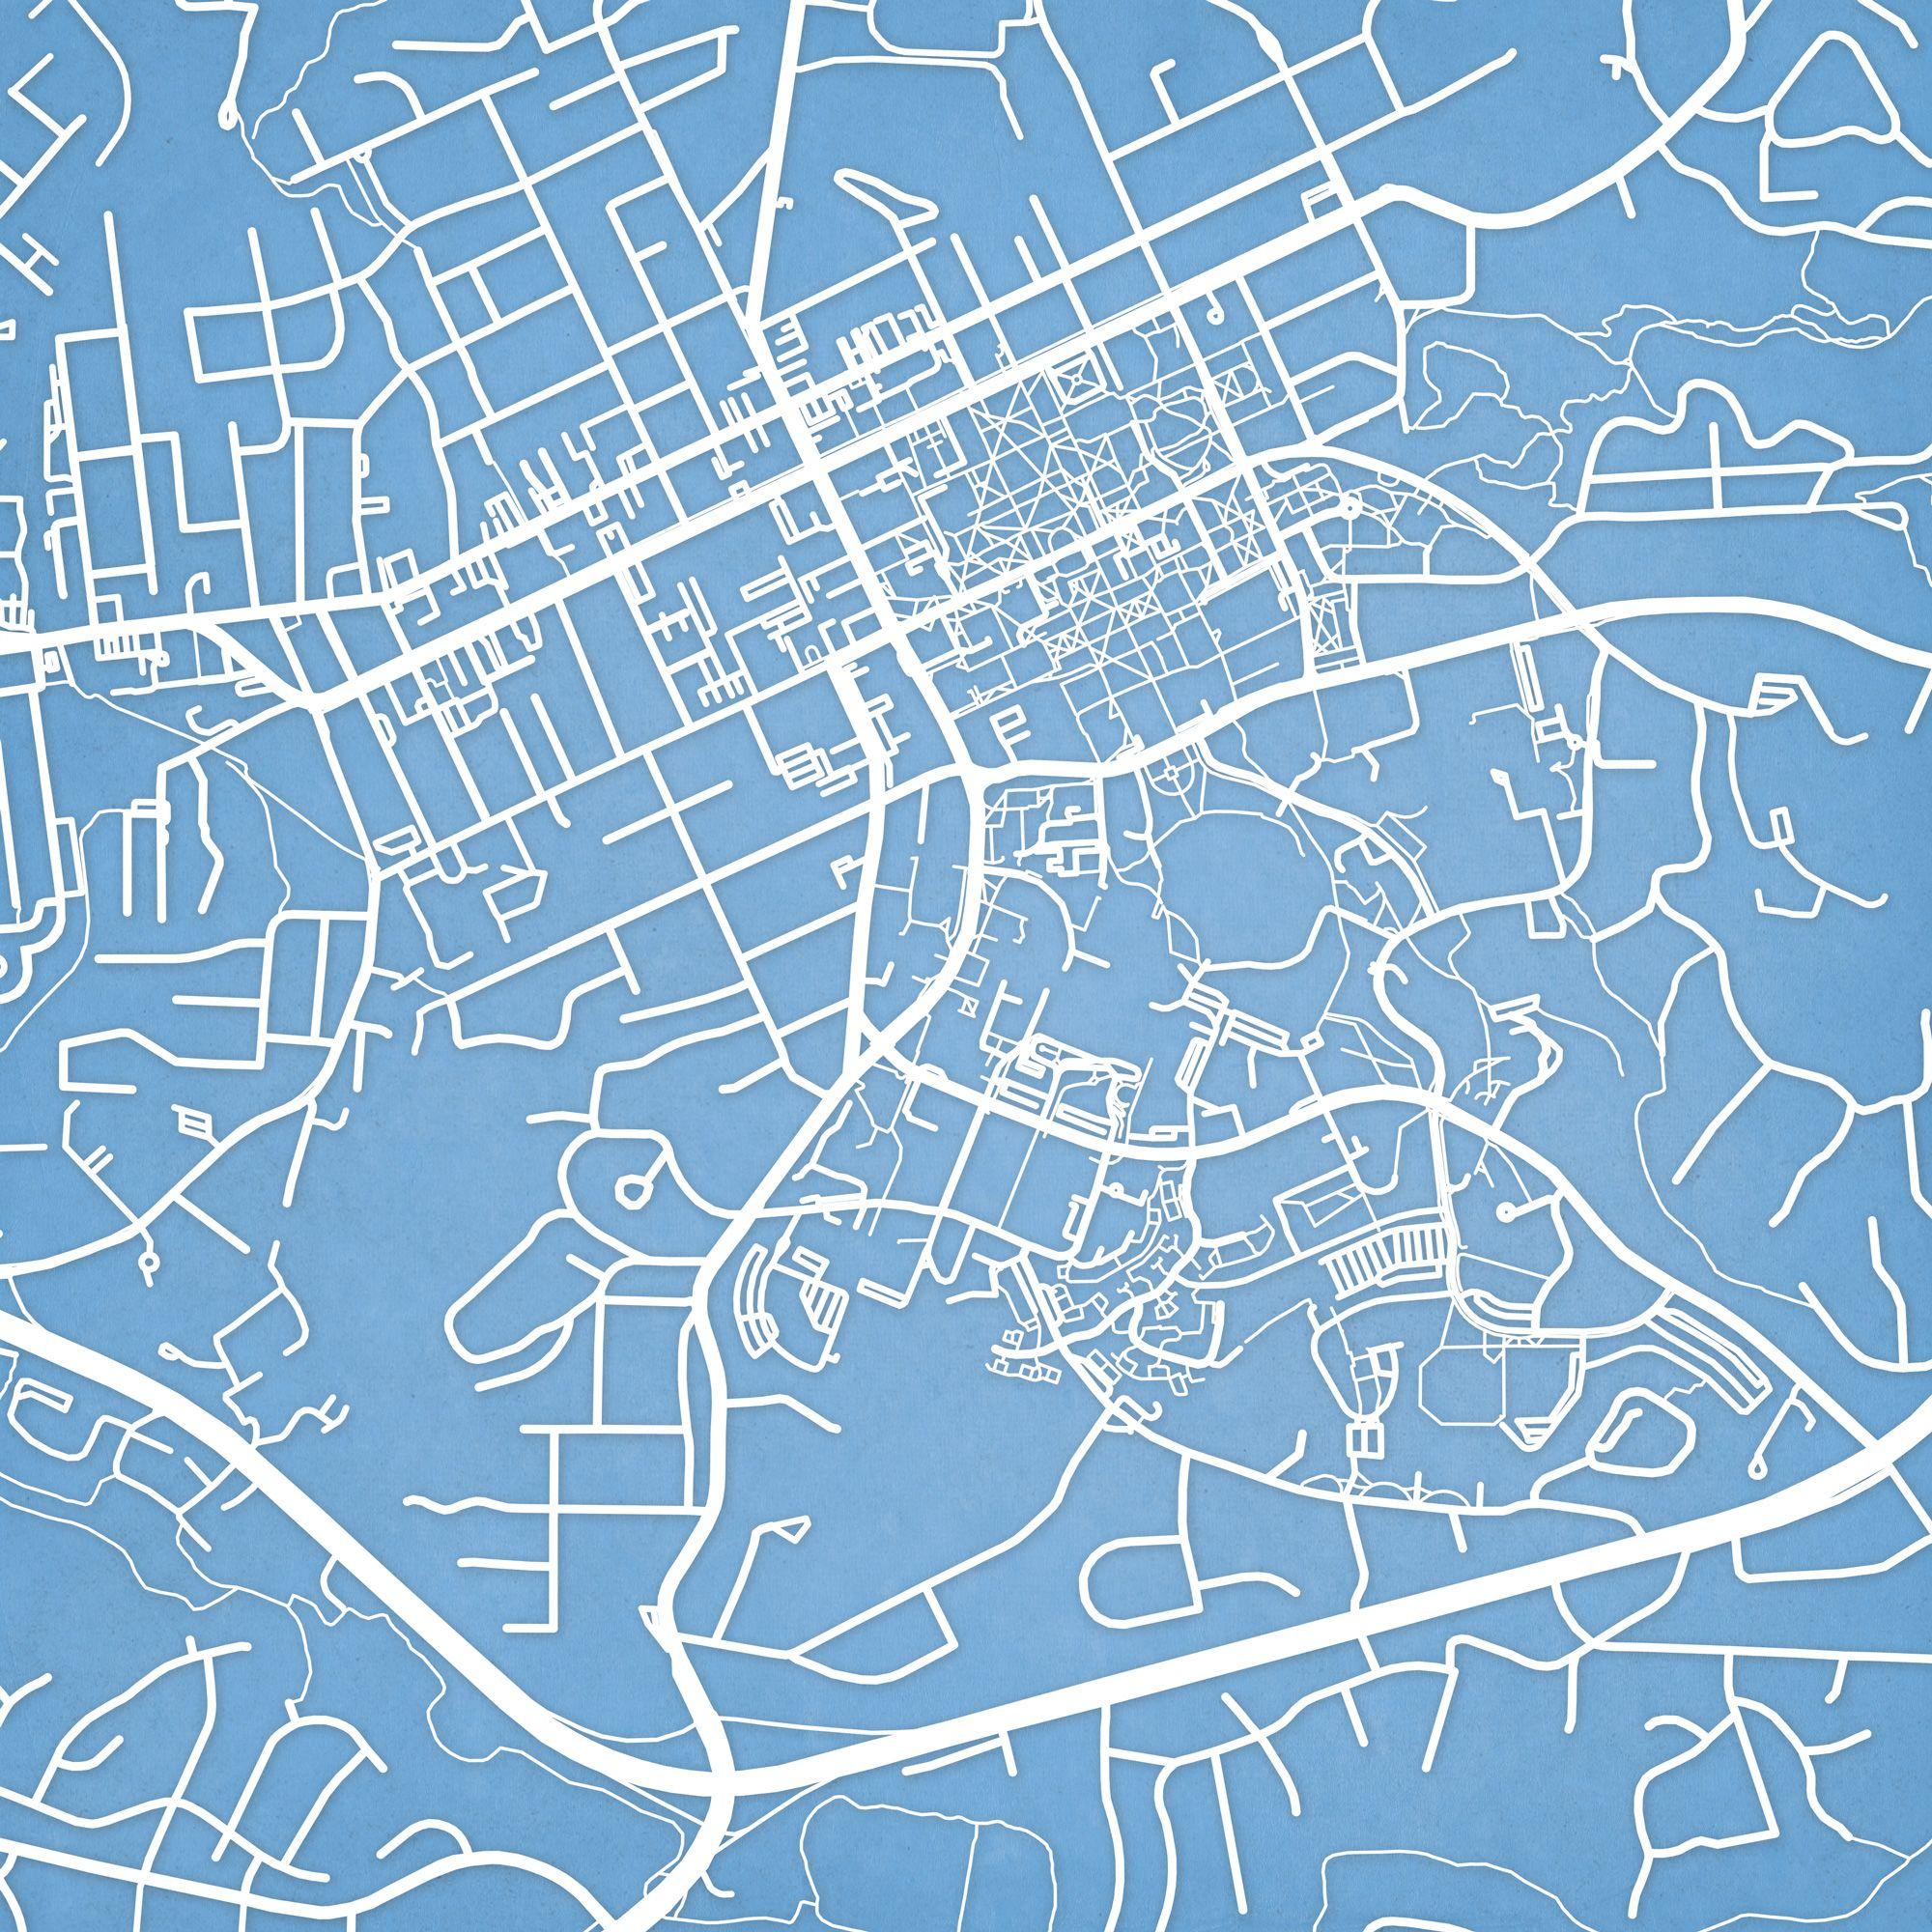 University Of North Carolina At Chapel Hill Campus Map Art With